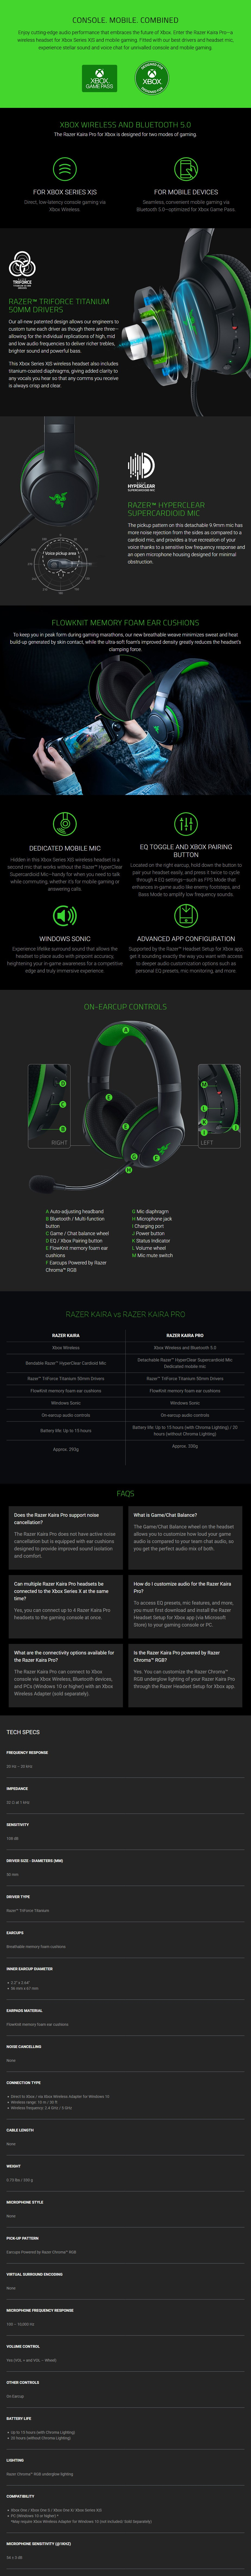 Razer Kaira Pro Wireless Gaming Headset for Xbox Series X - Overview 1